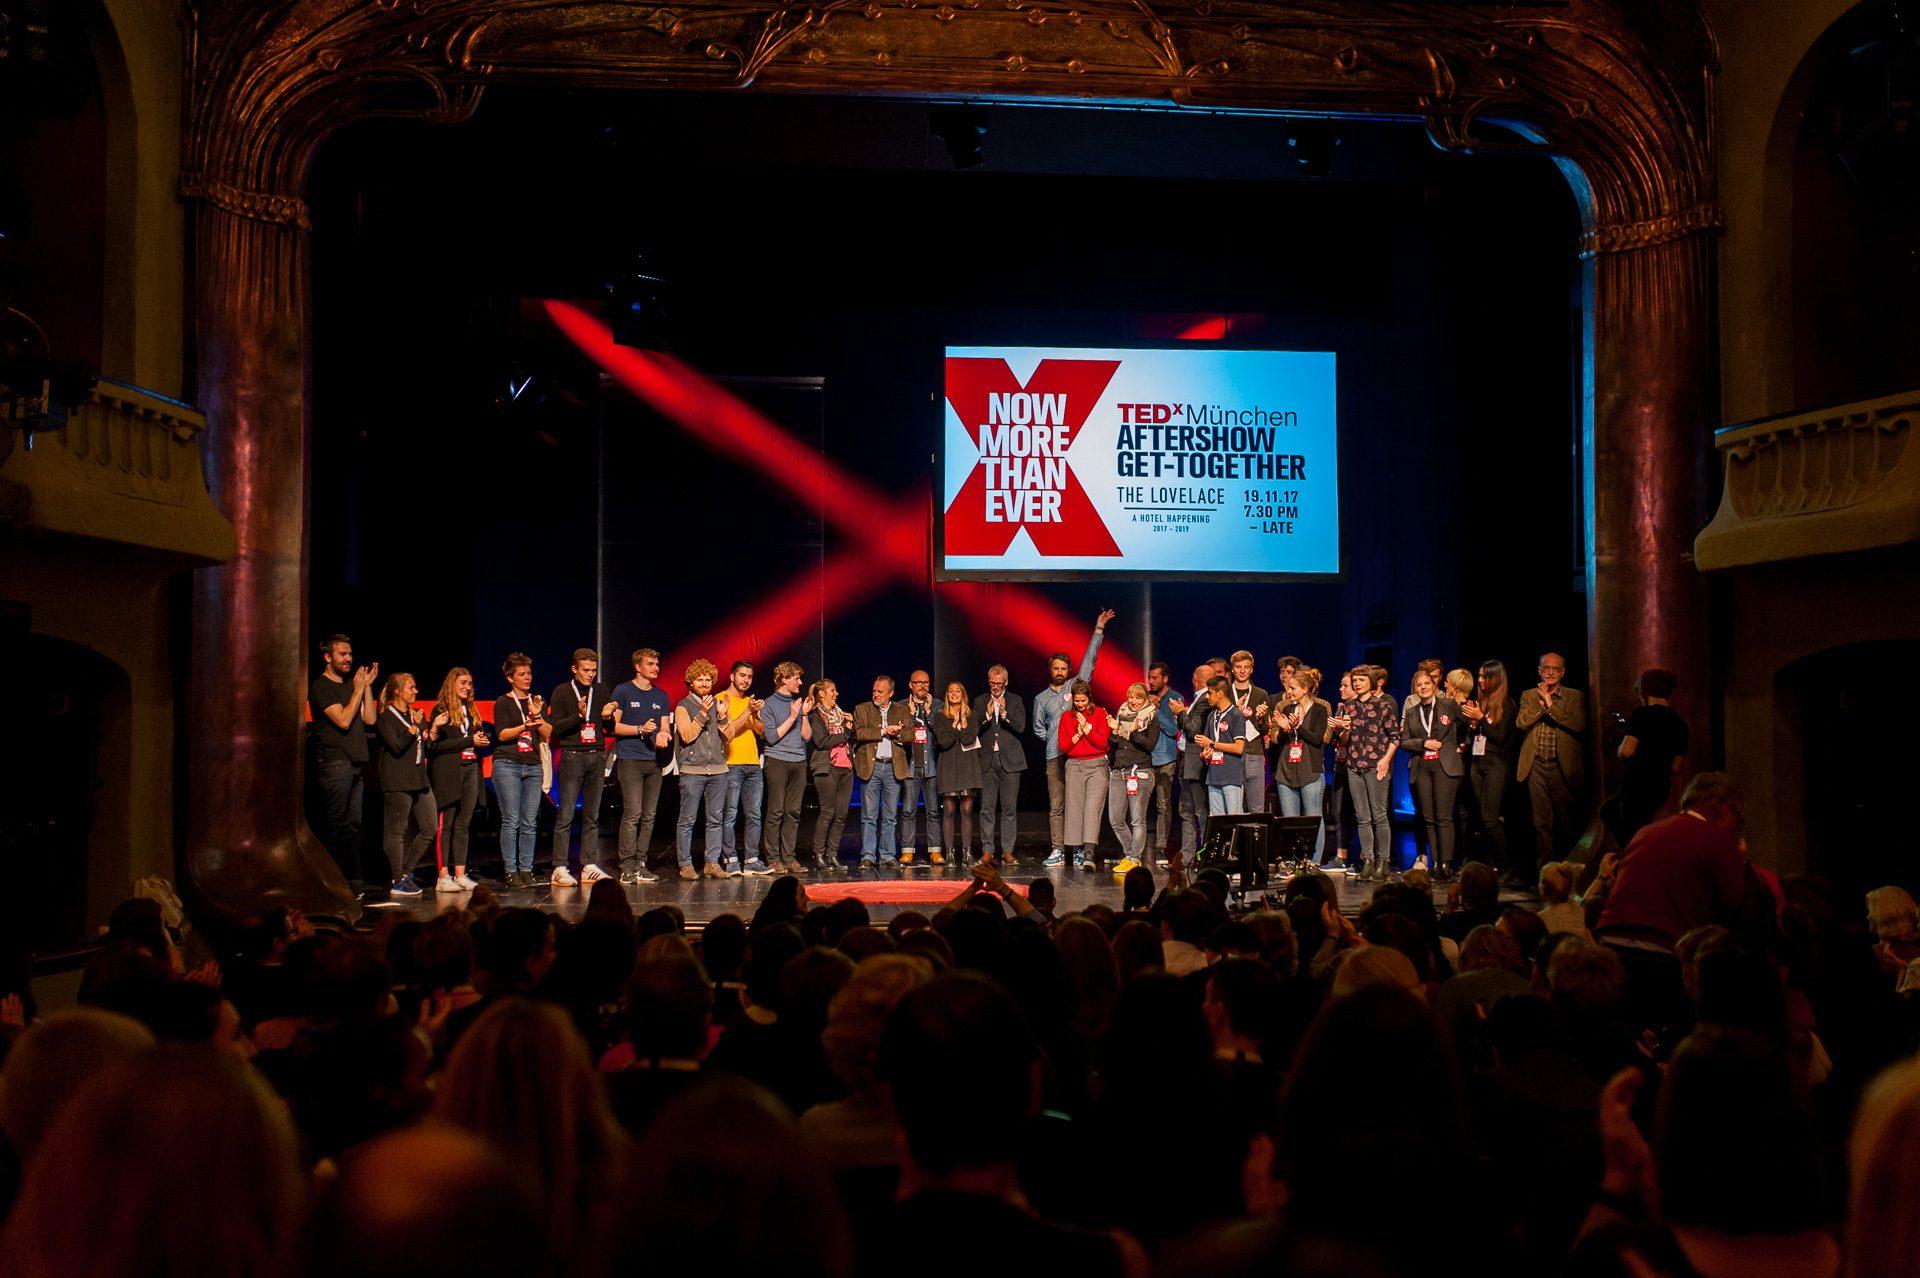 Eventfotografie in München |TEDxMünchen 2017 © offenblende.de